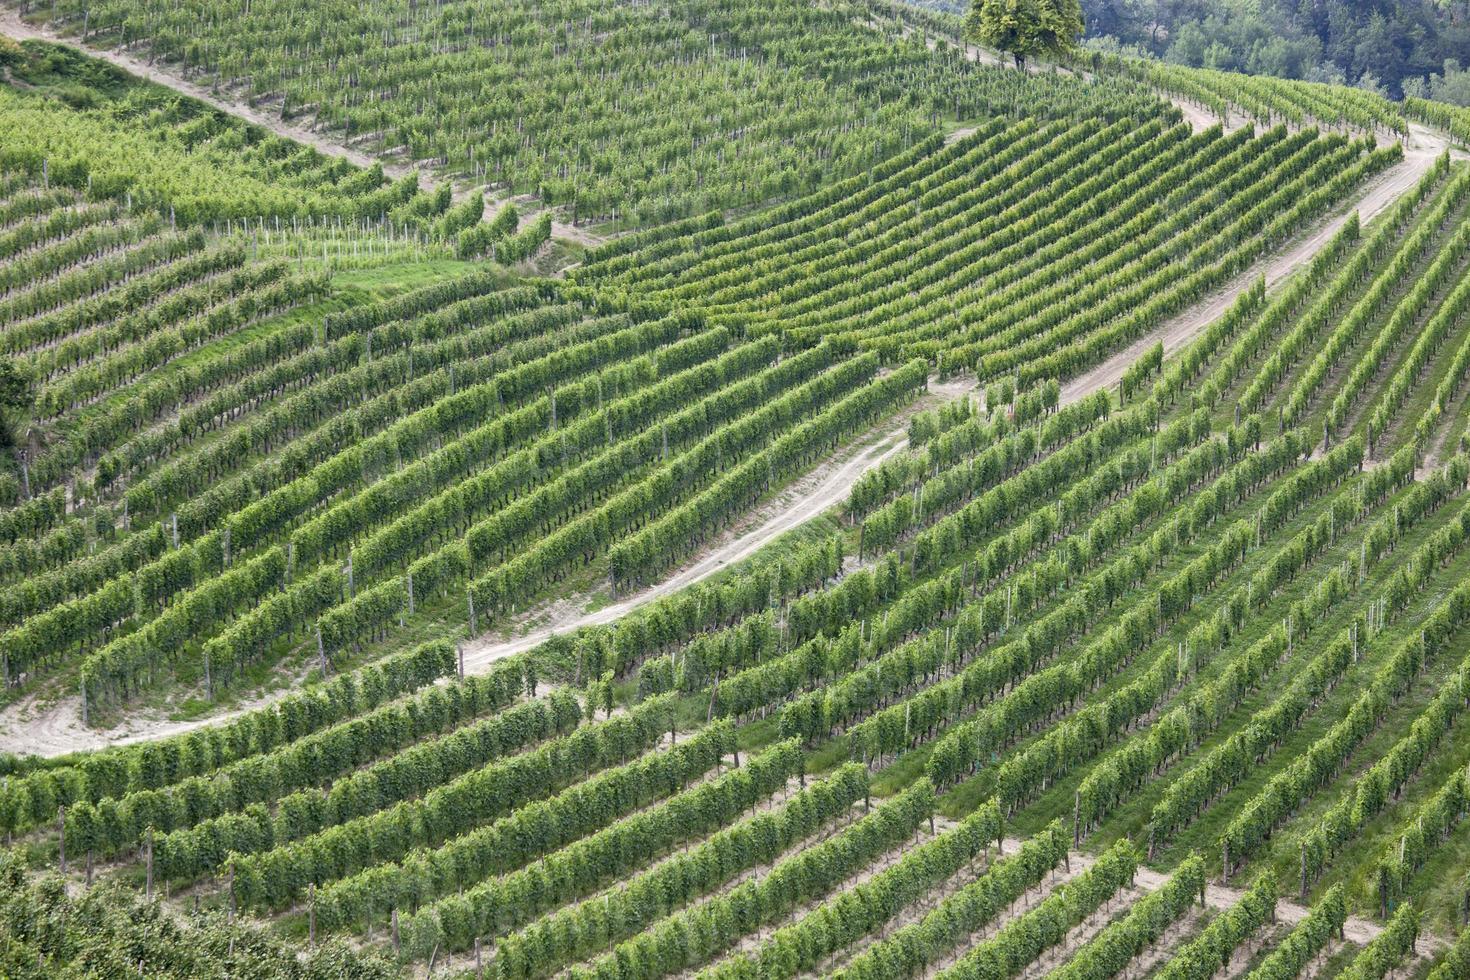 vineyards in Italy photo